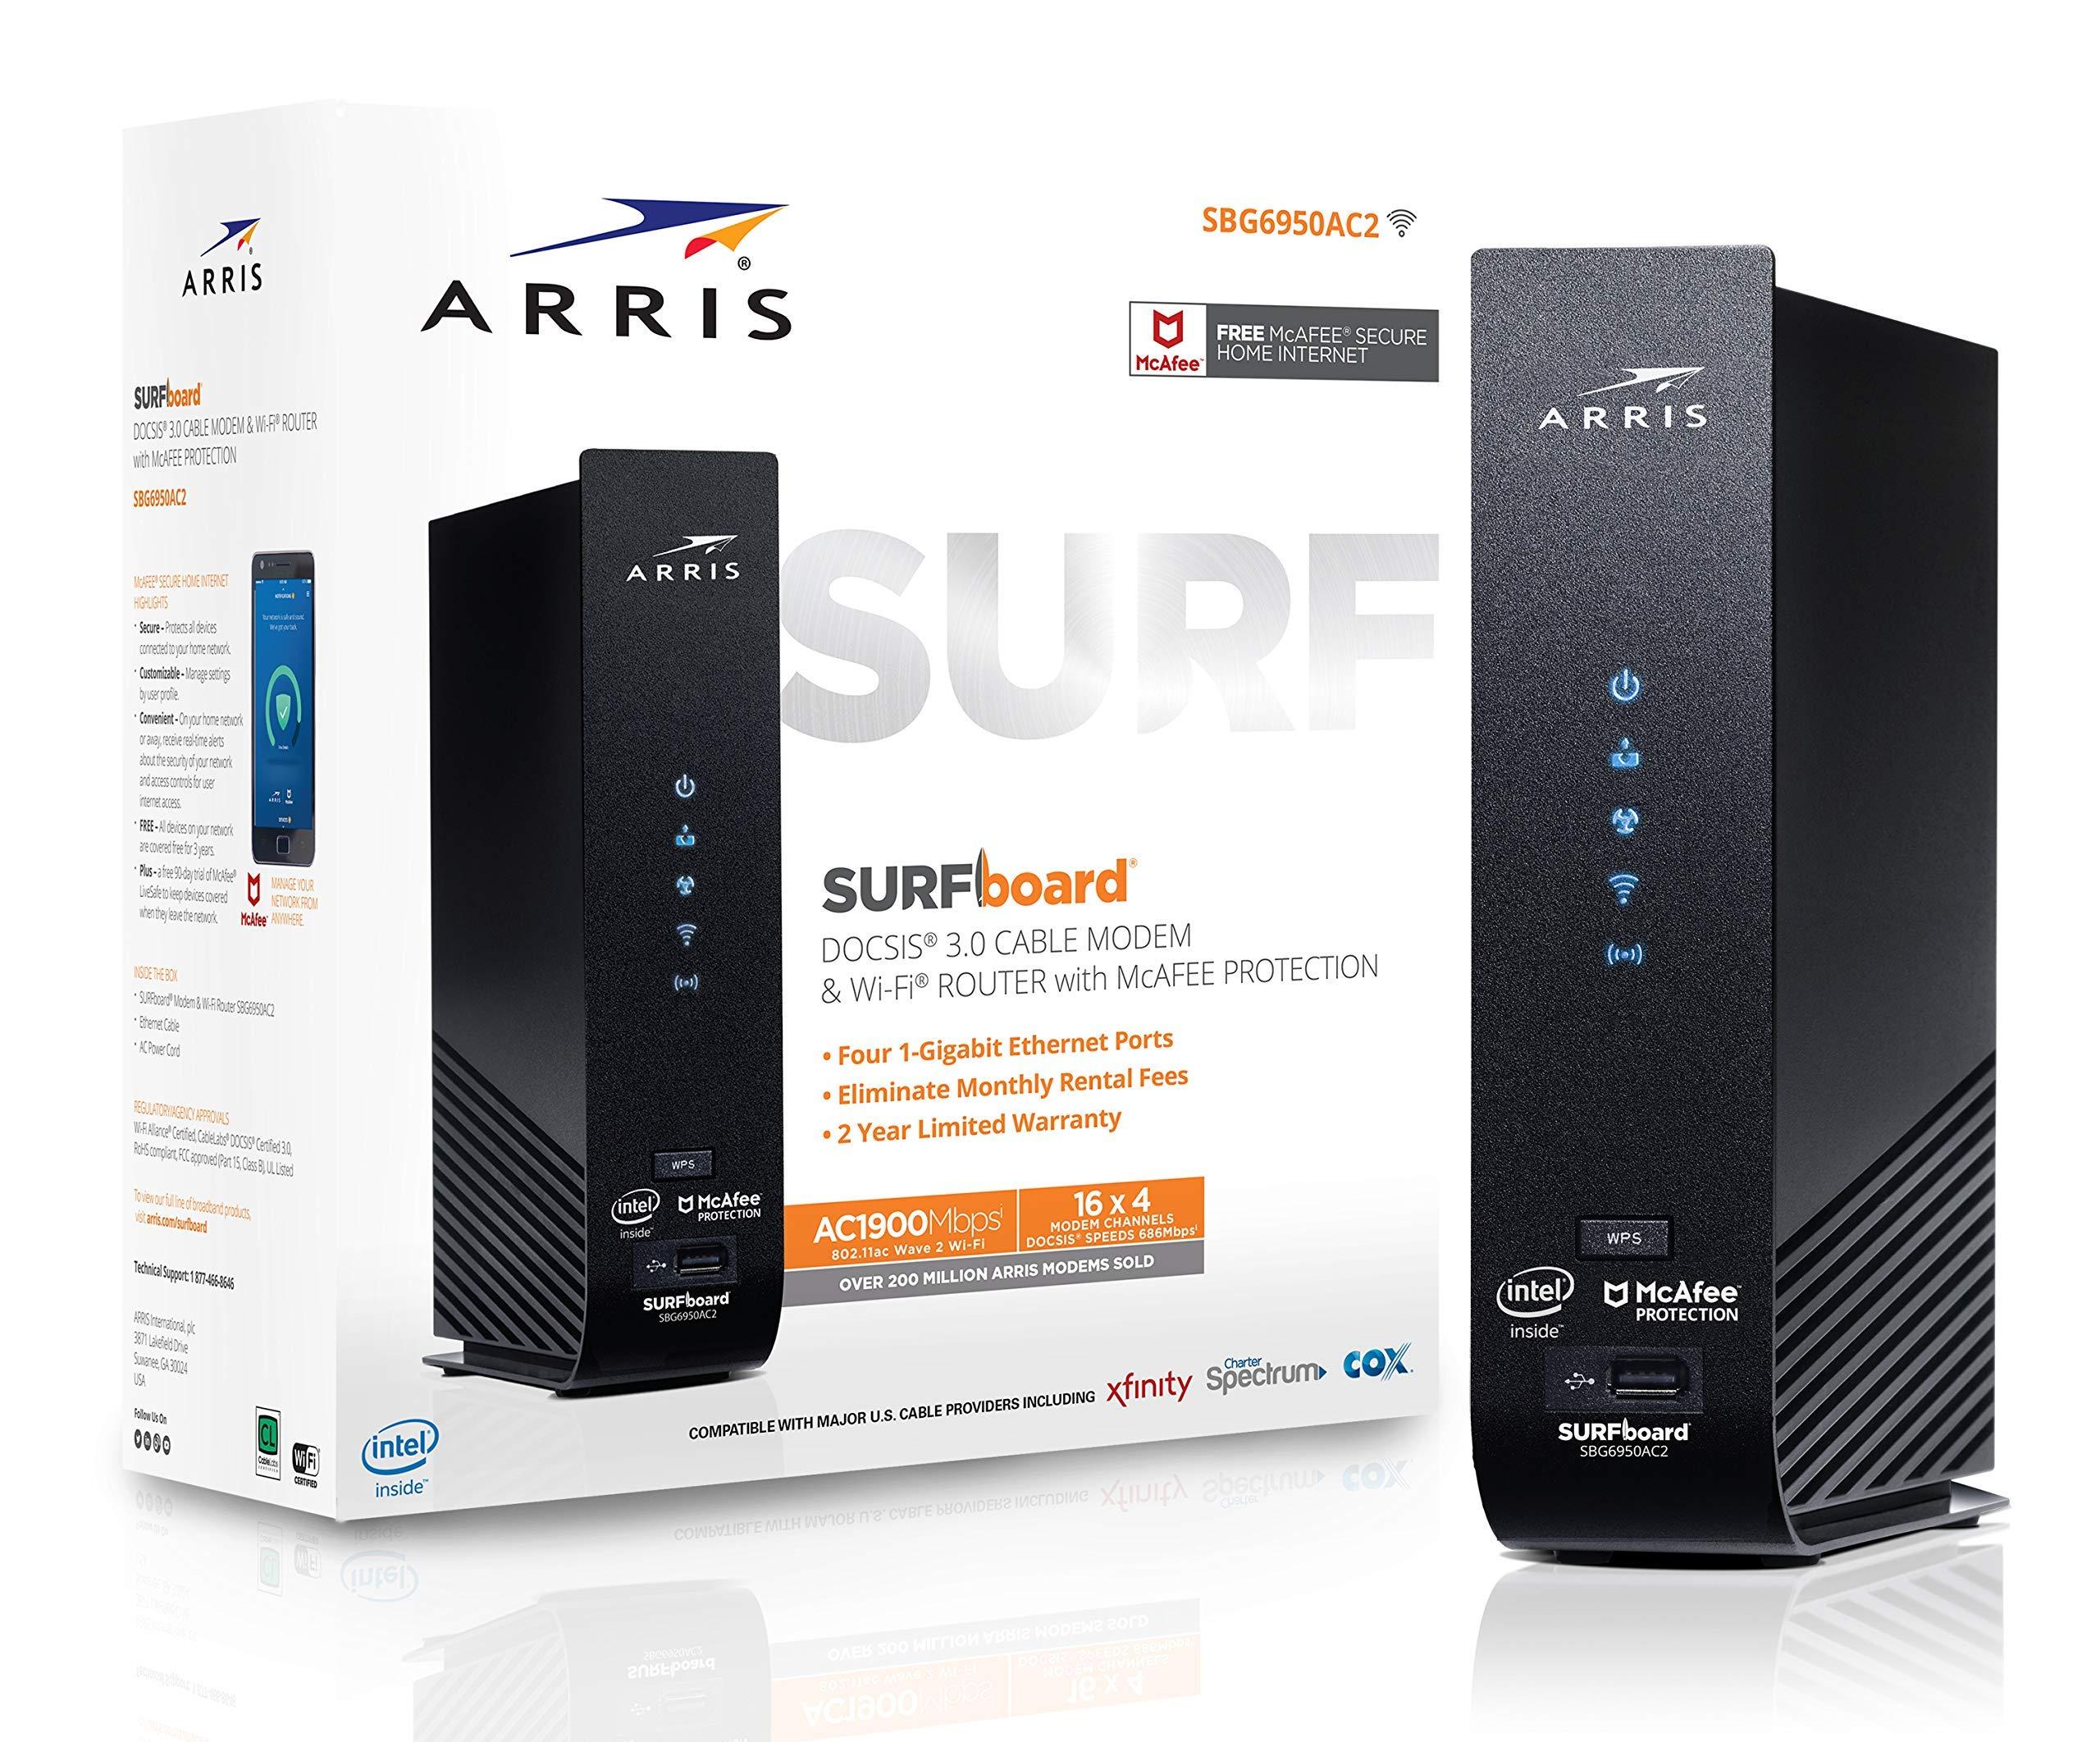 ARRIS SURFboard Certified Spectrum SBG6950AC2